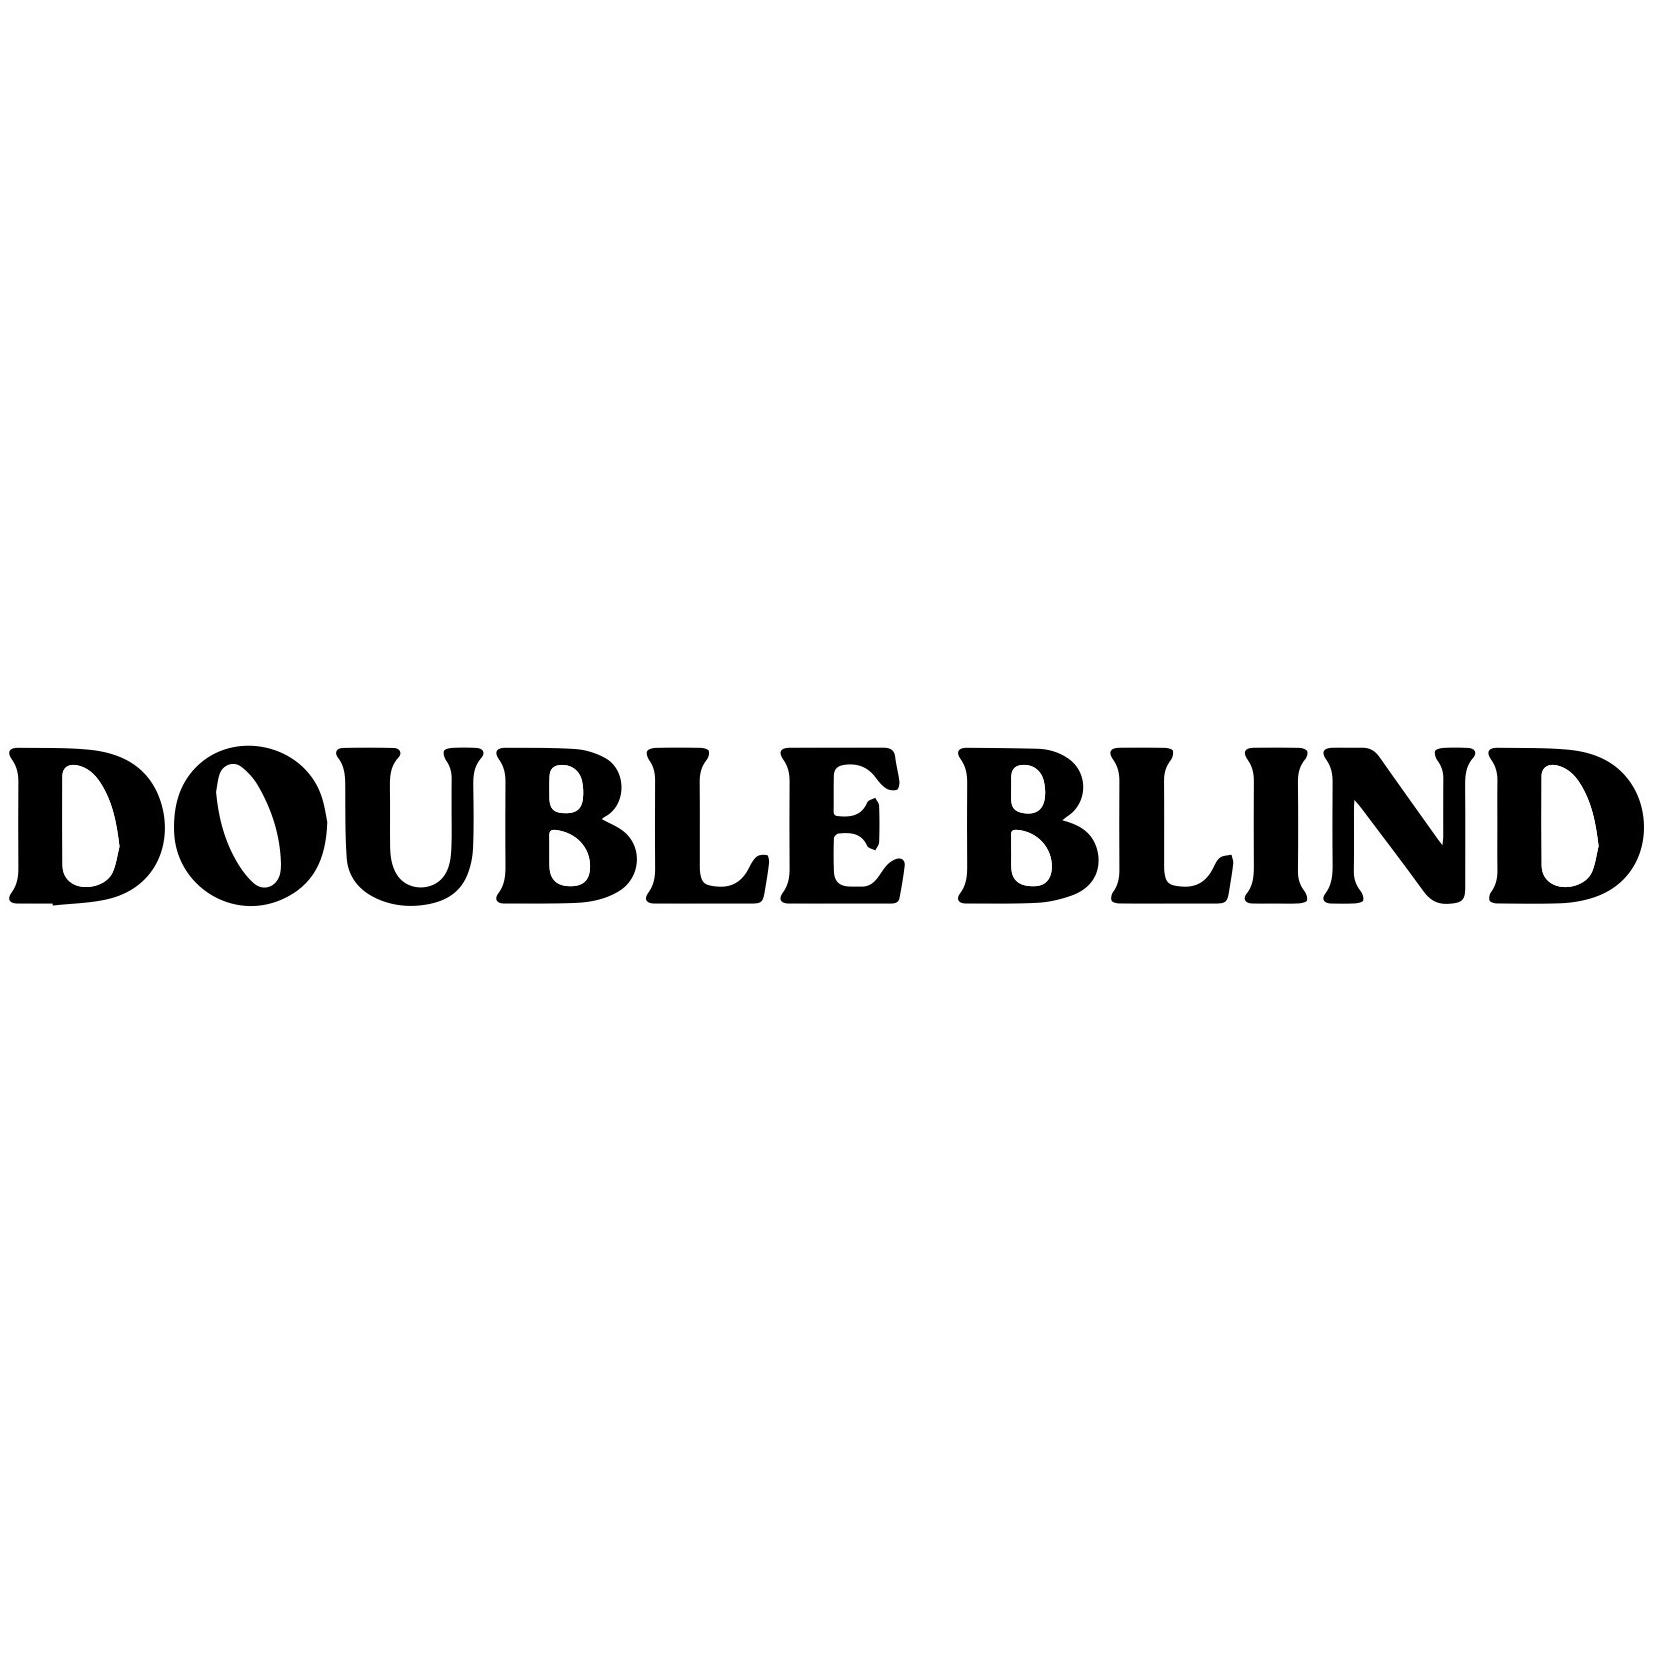 DoubleBlind Logo (1).jpg